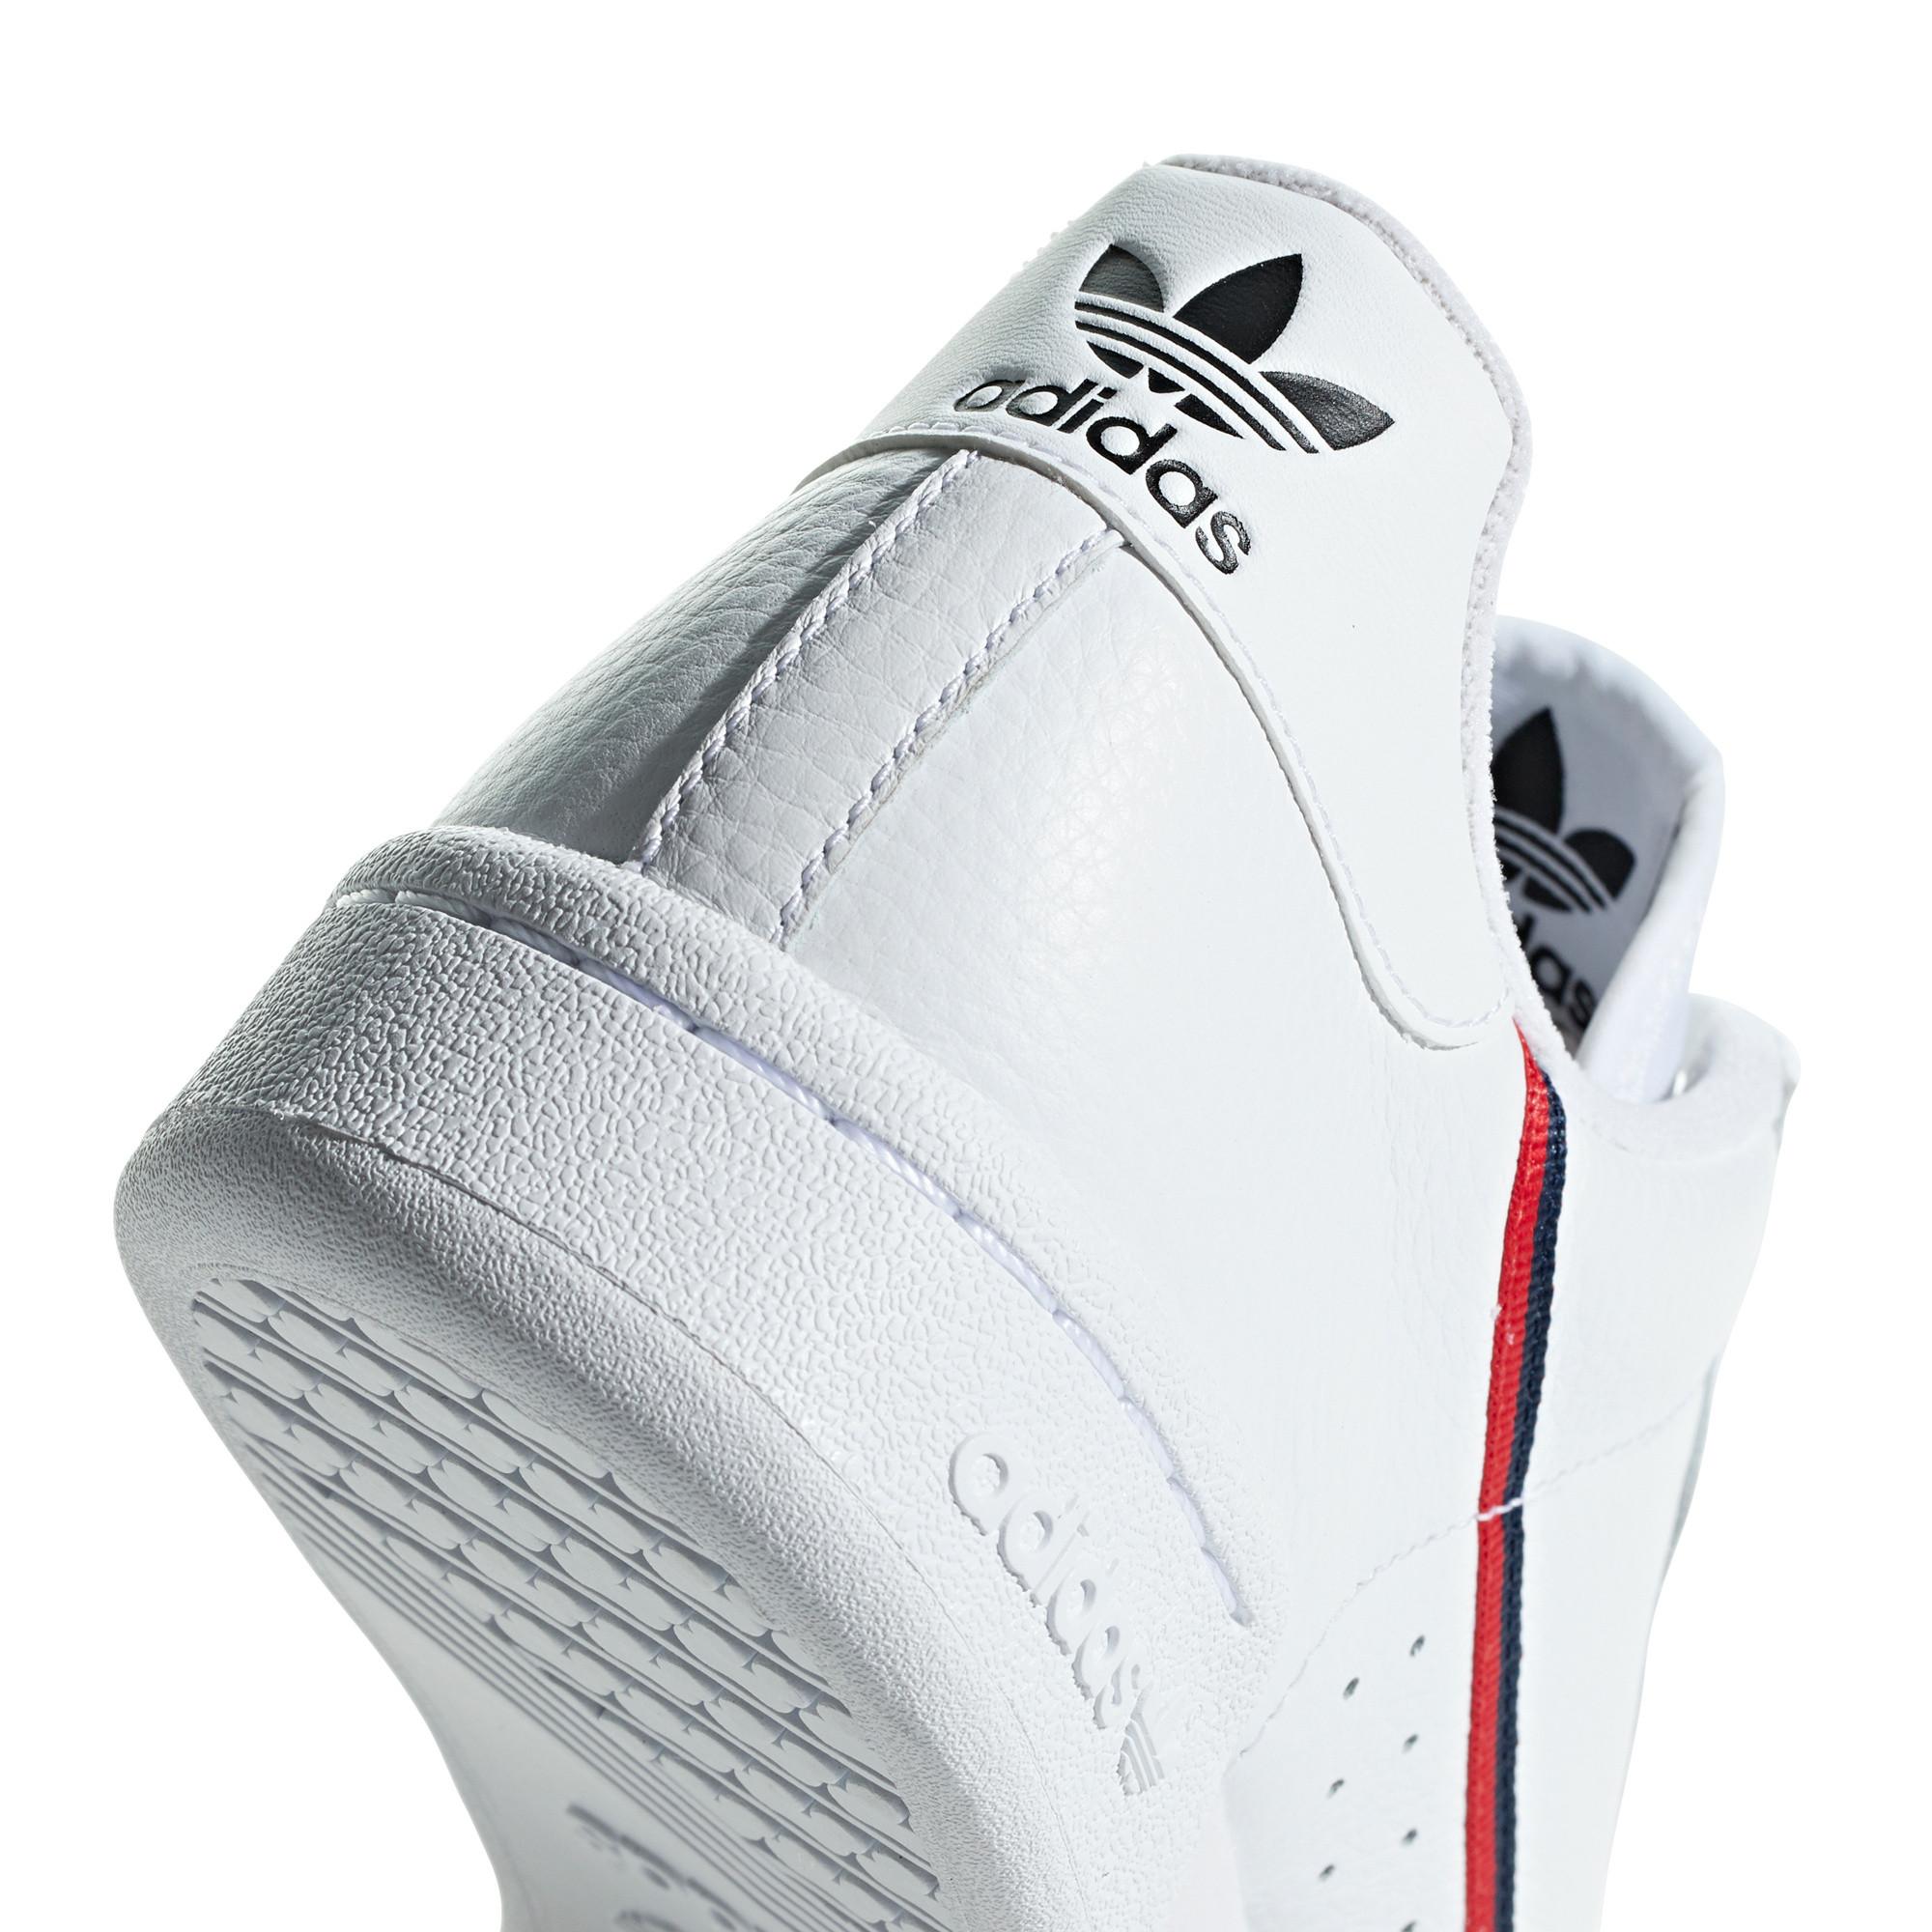 Scarpe uomo Continental 80, Bianco, large image number 1